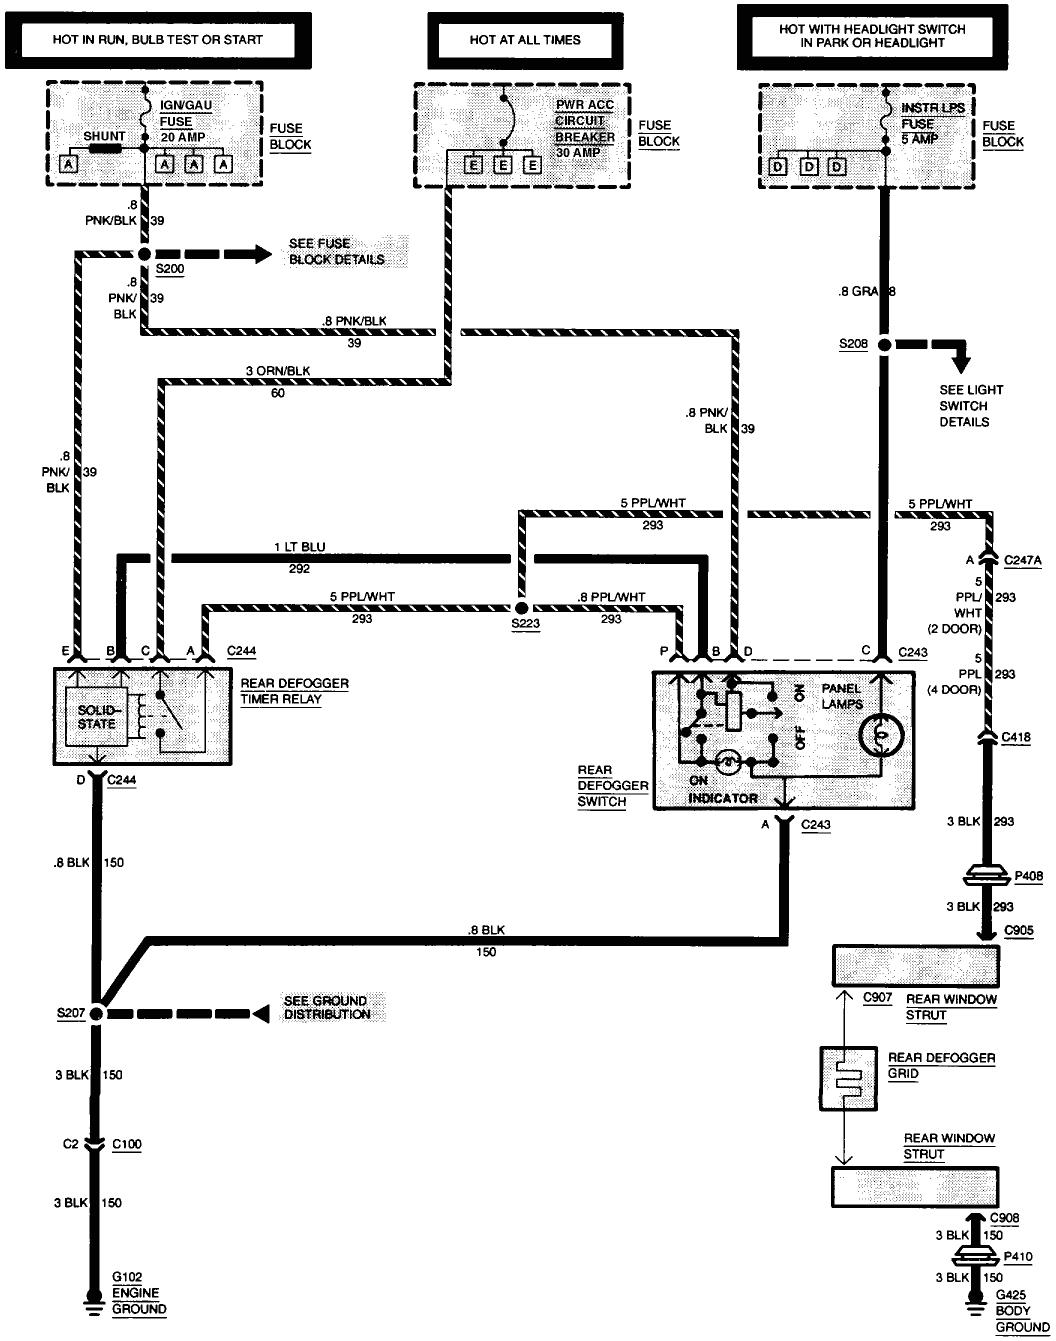 1994 s10 wiring diagram wiring diagram rows 1994 s10 wiring diagram